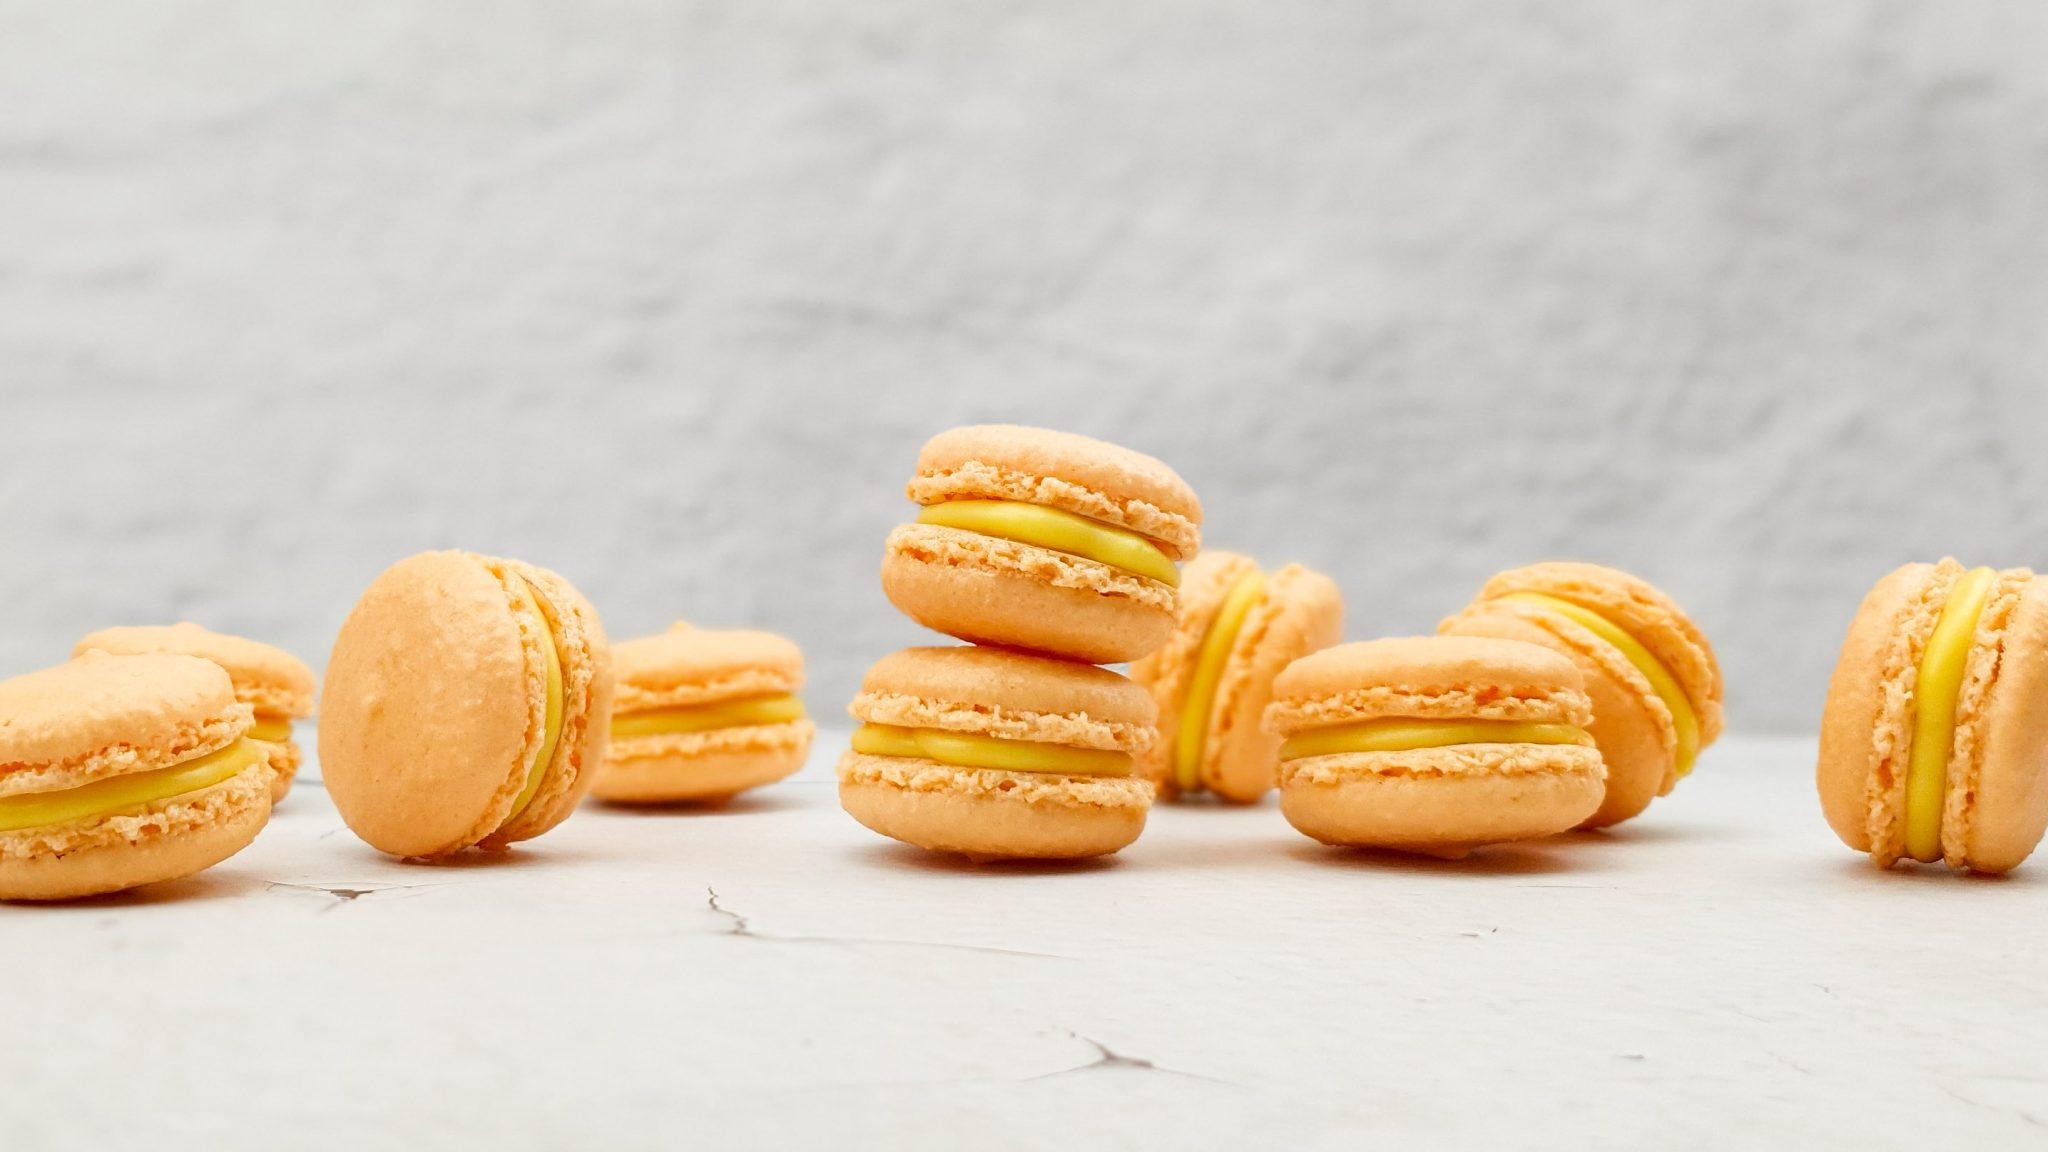 Passievrucht macarons met witte chocolade